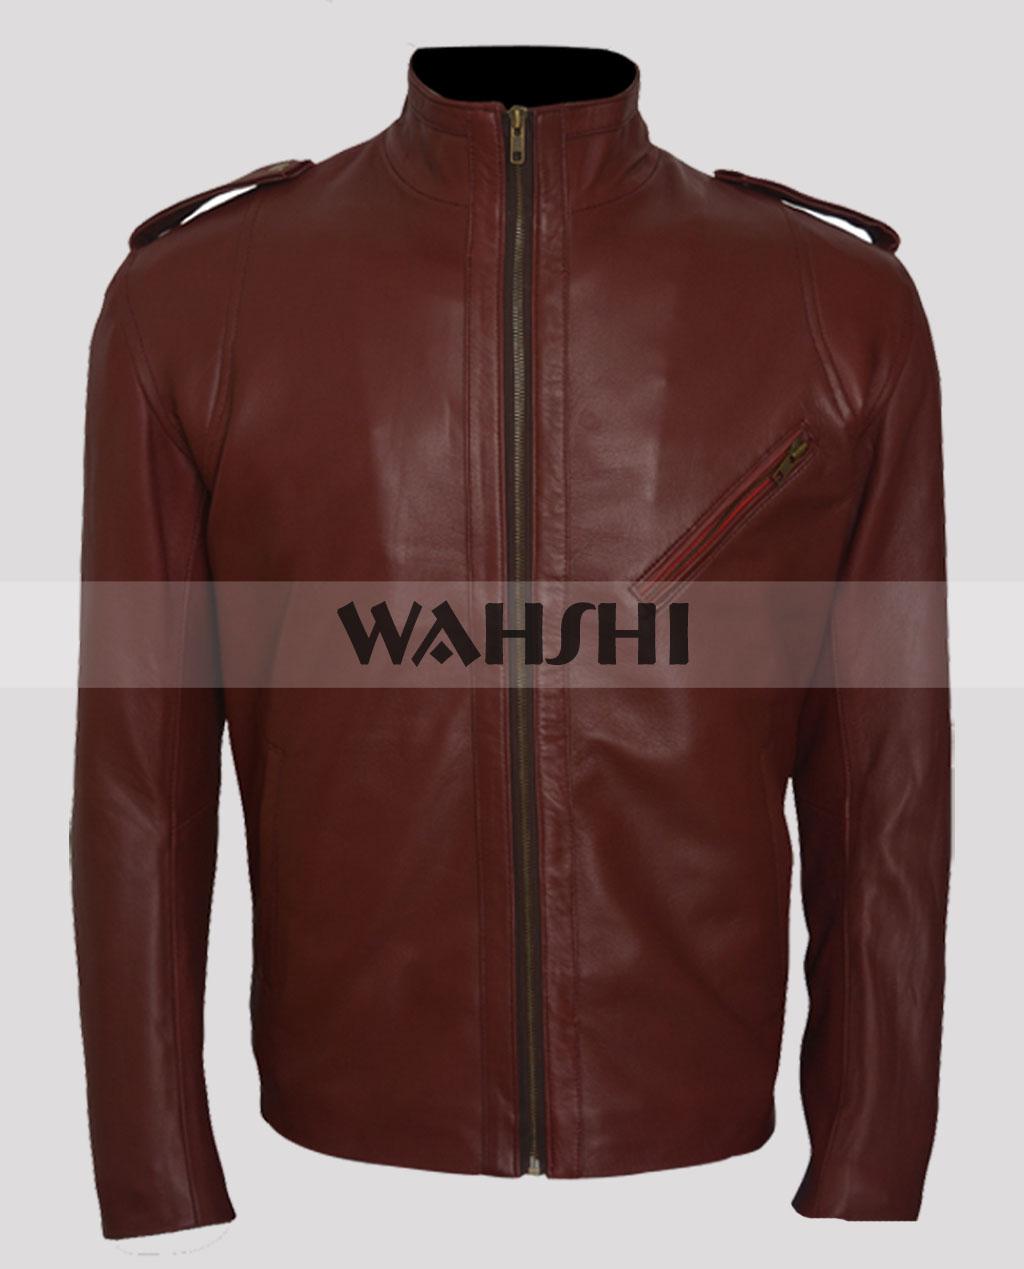 ash-vs-evil-dead-costume-leather